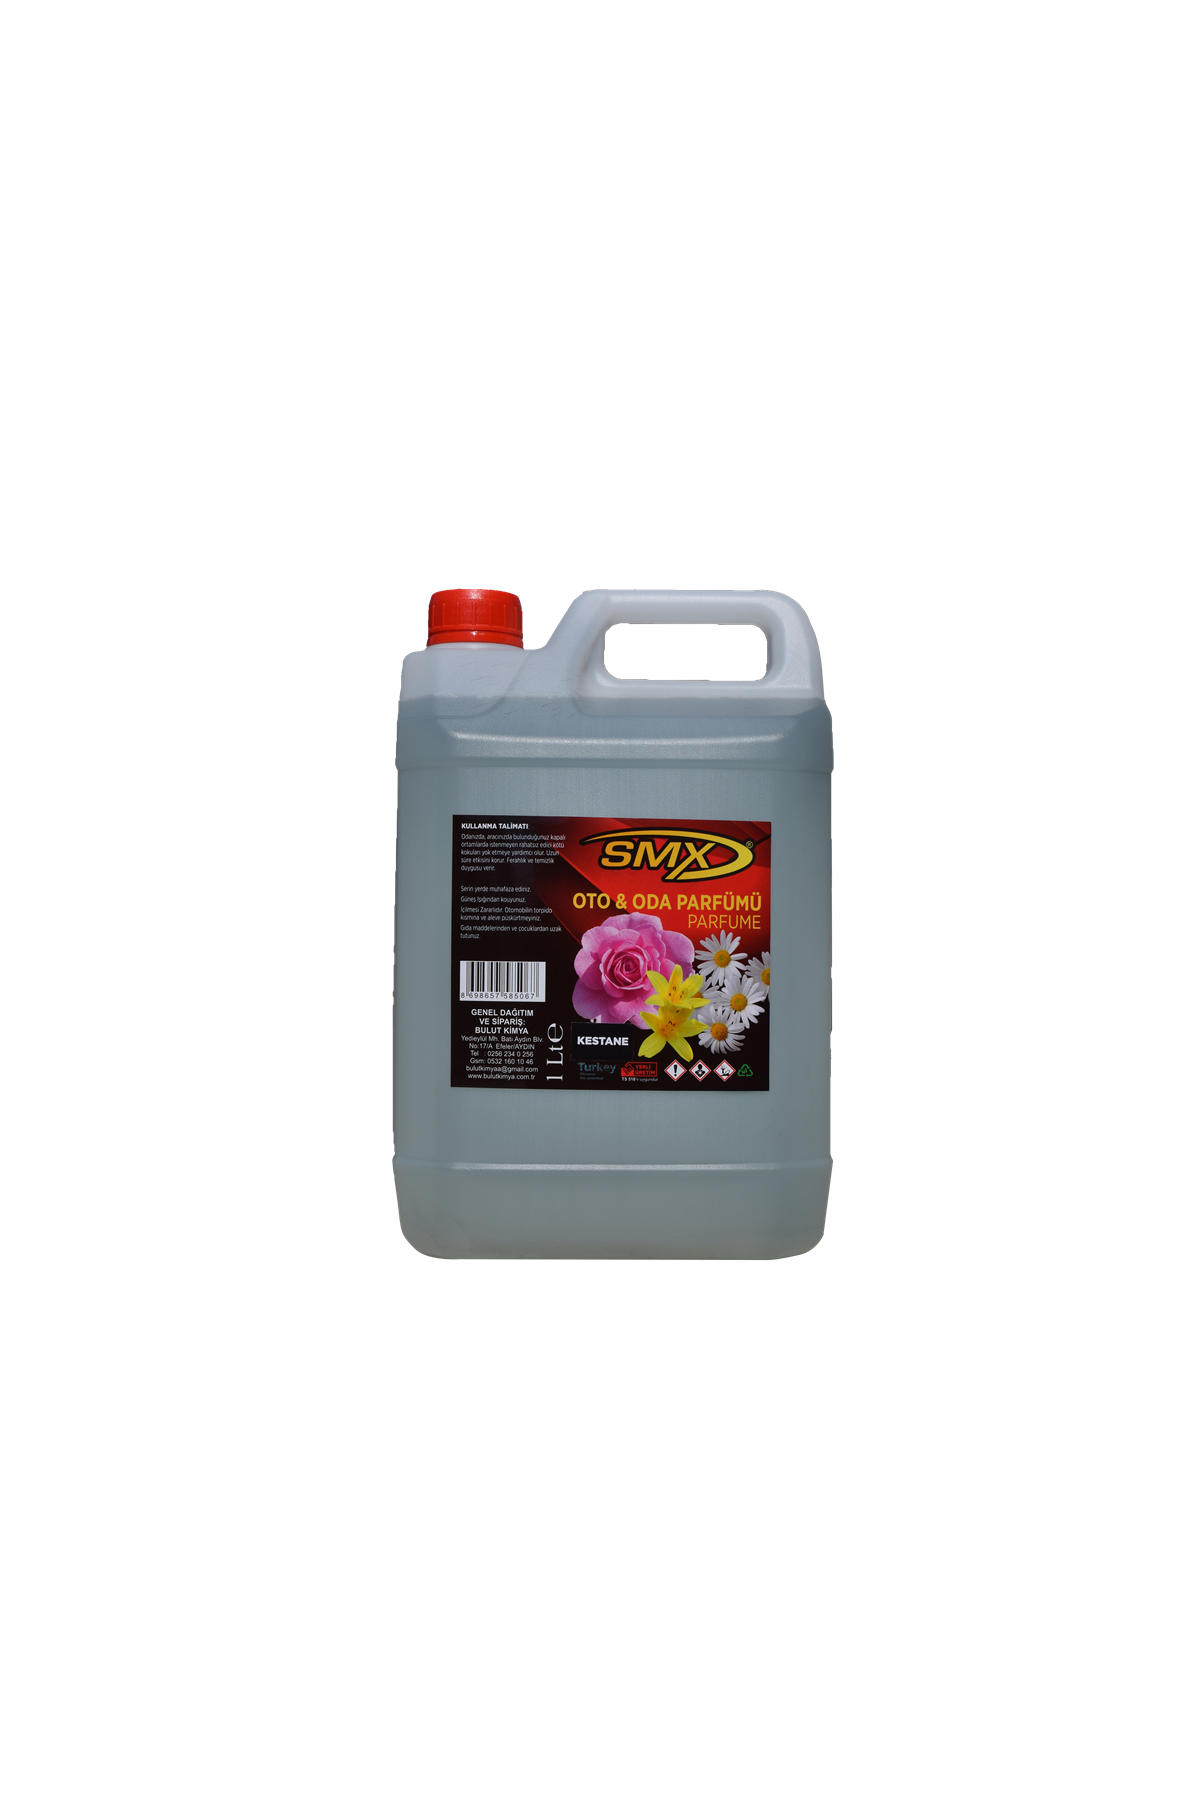 SMX Oto Parfümü / Oda Parfümü / Kestane Koku (5LT)